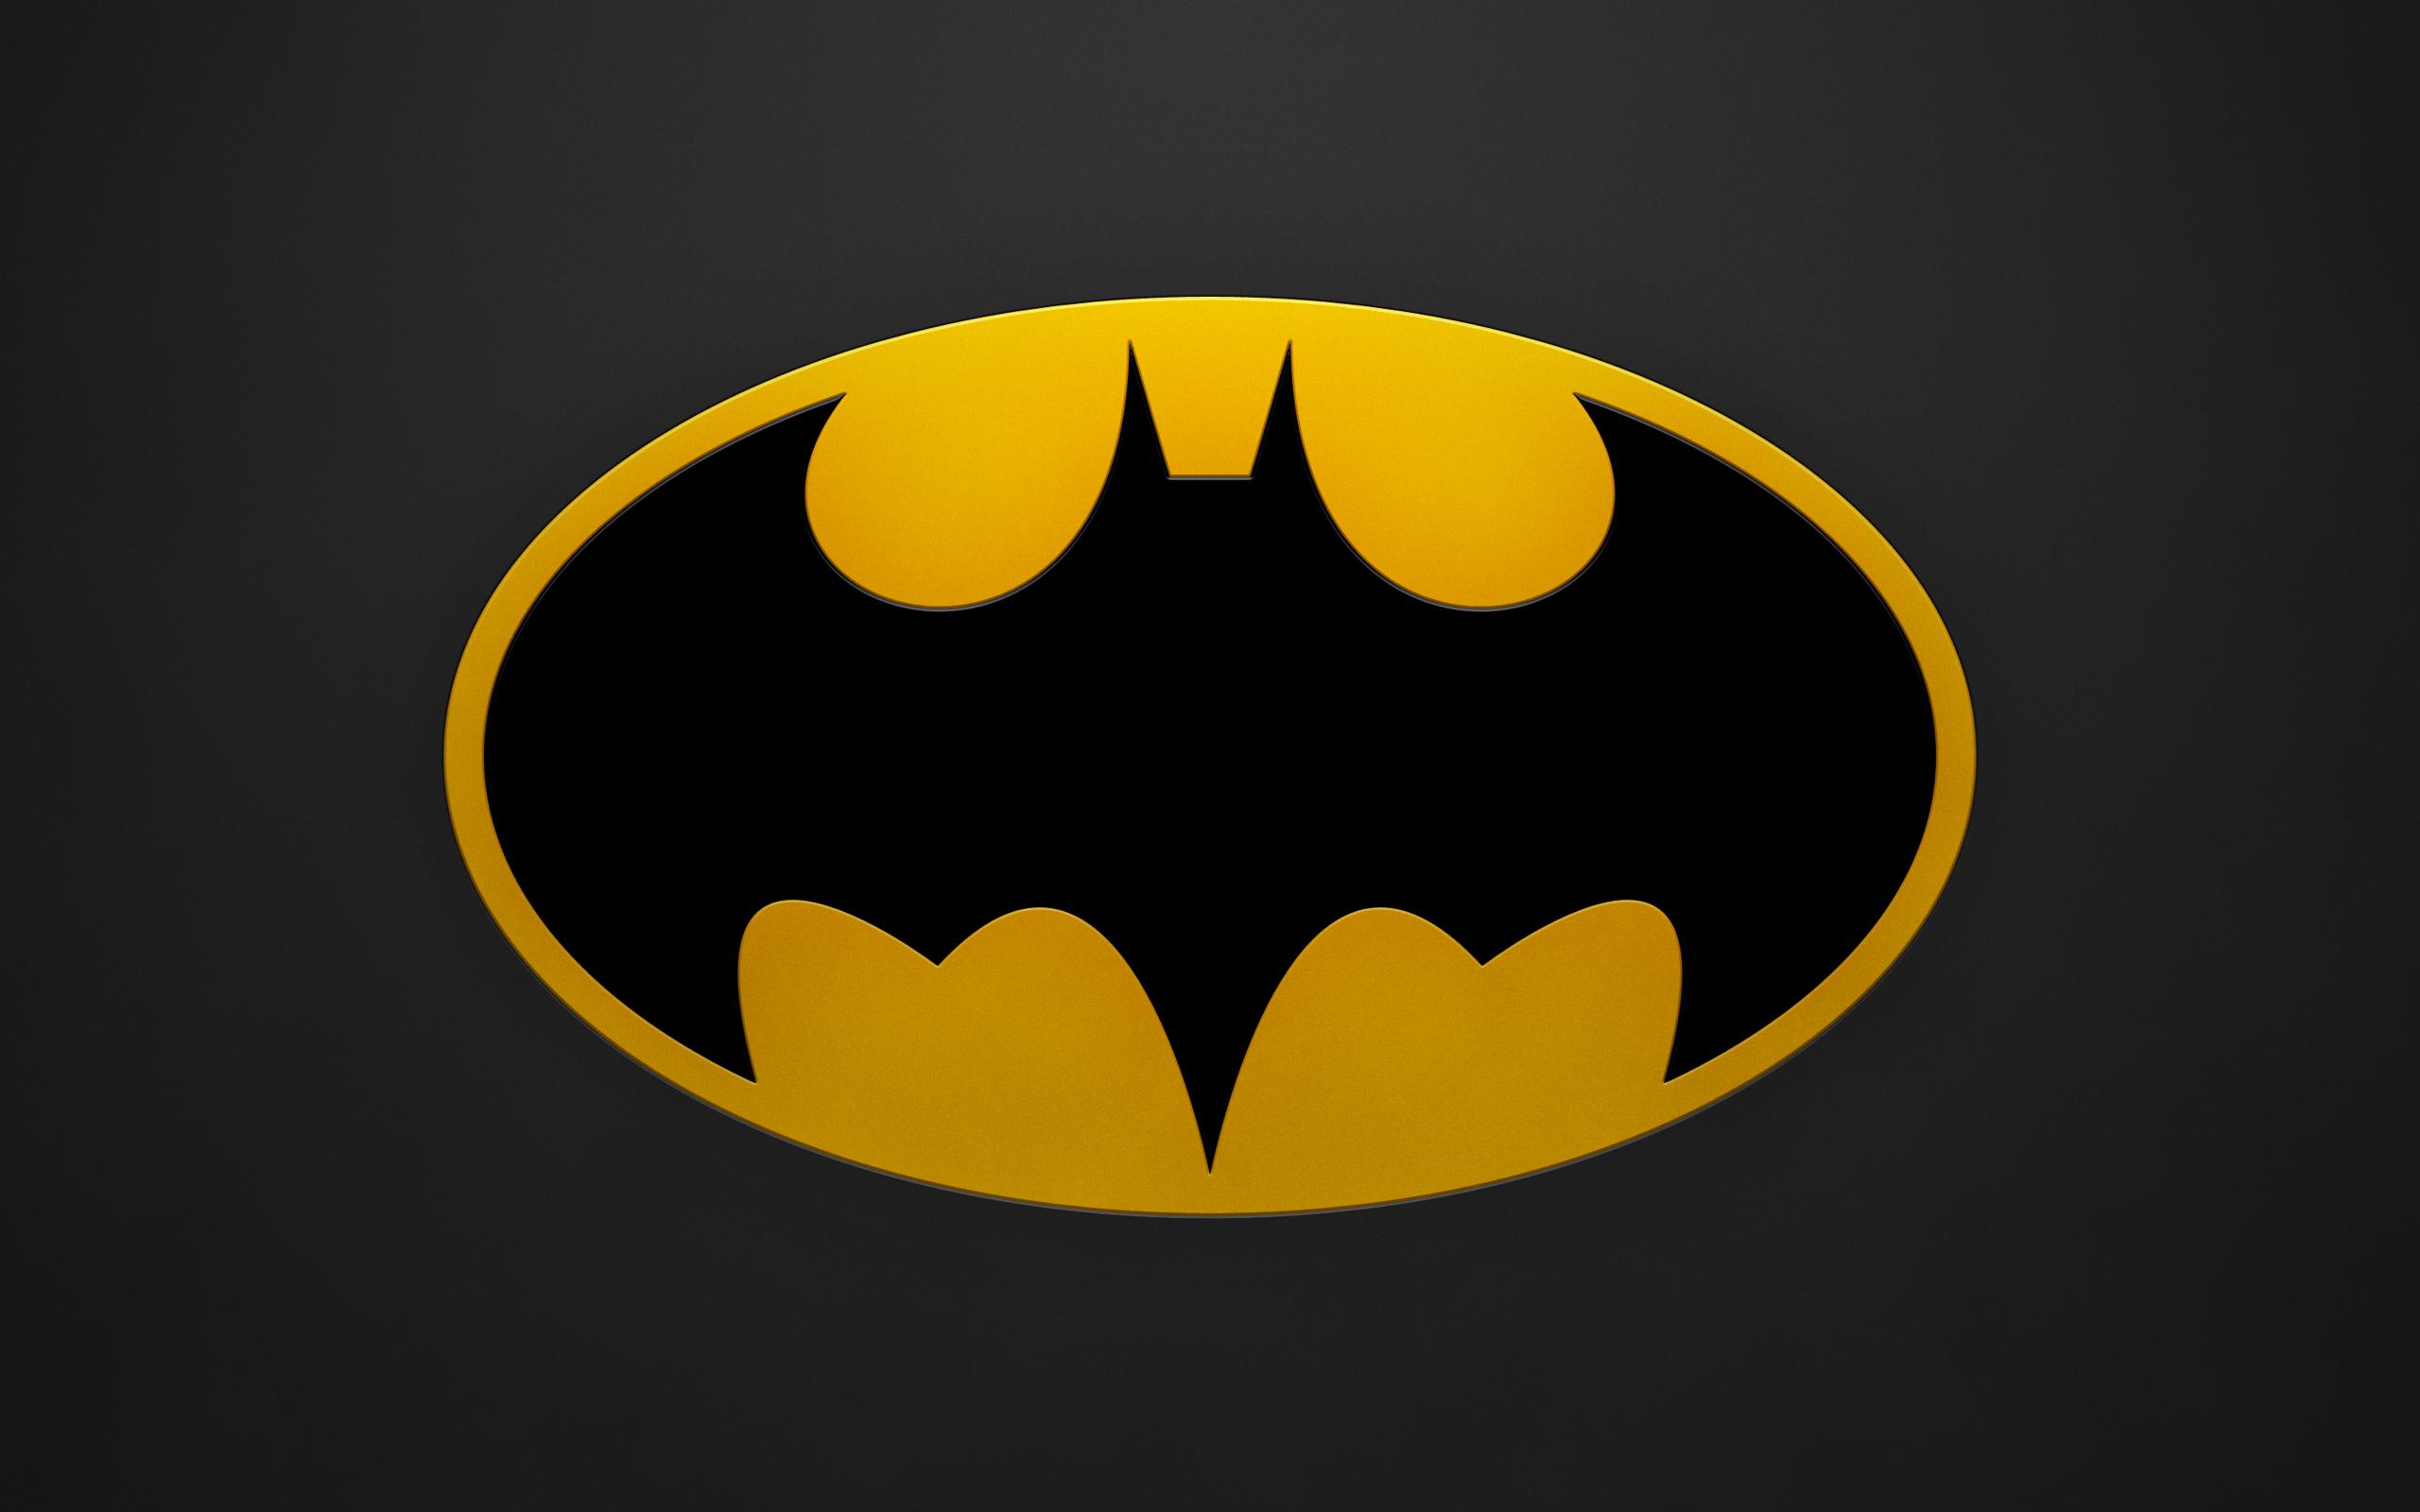 Batman Logo Wallpaper Background HD Desktop Wallpapers 2560x1600